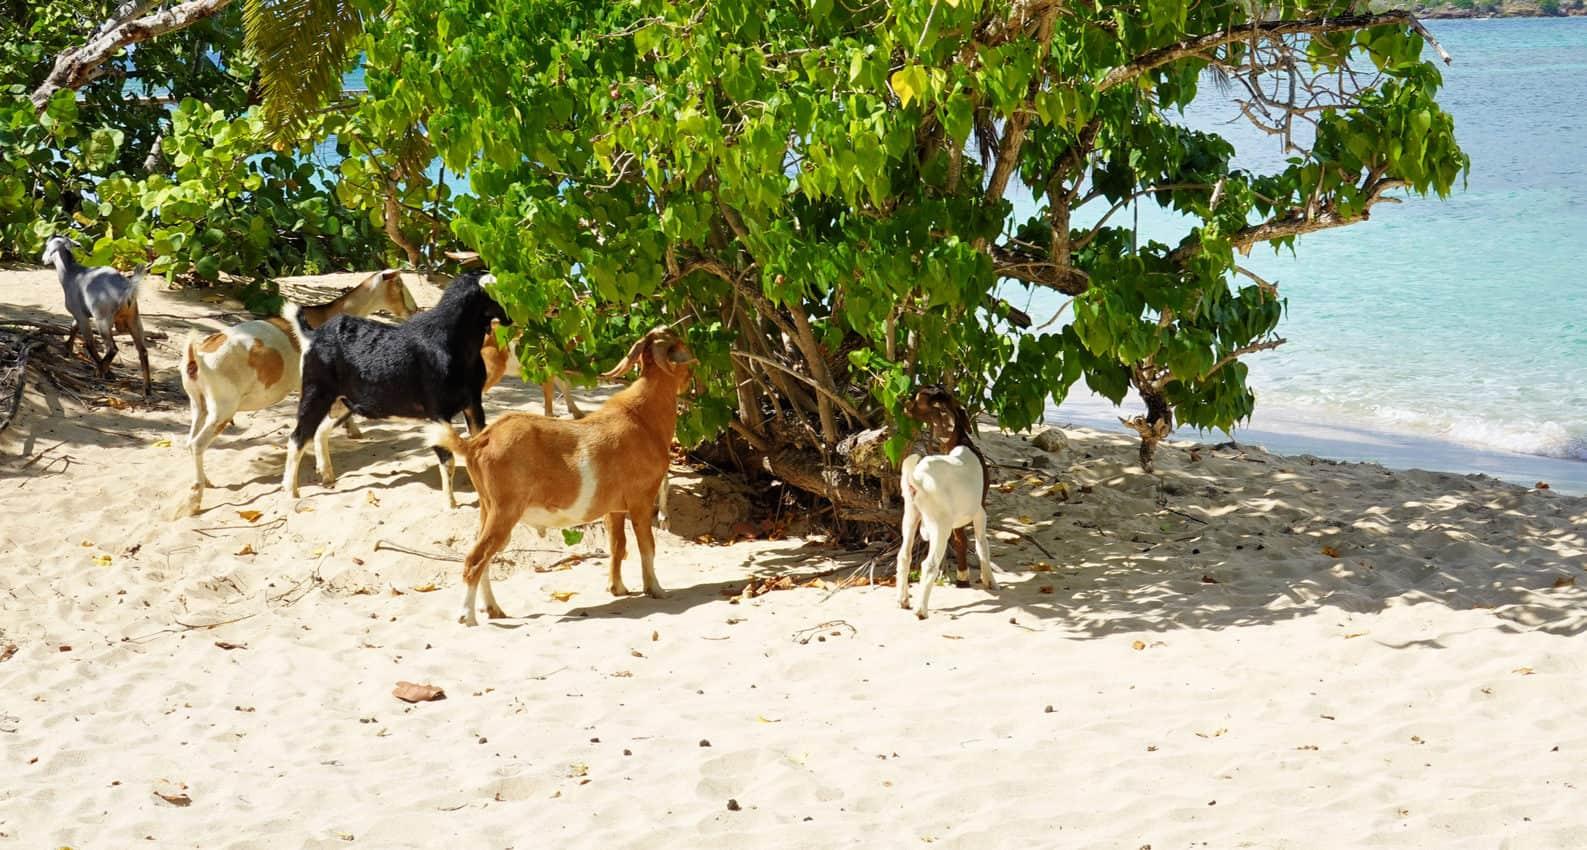 Goats do roam on Antigua beaches